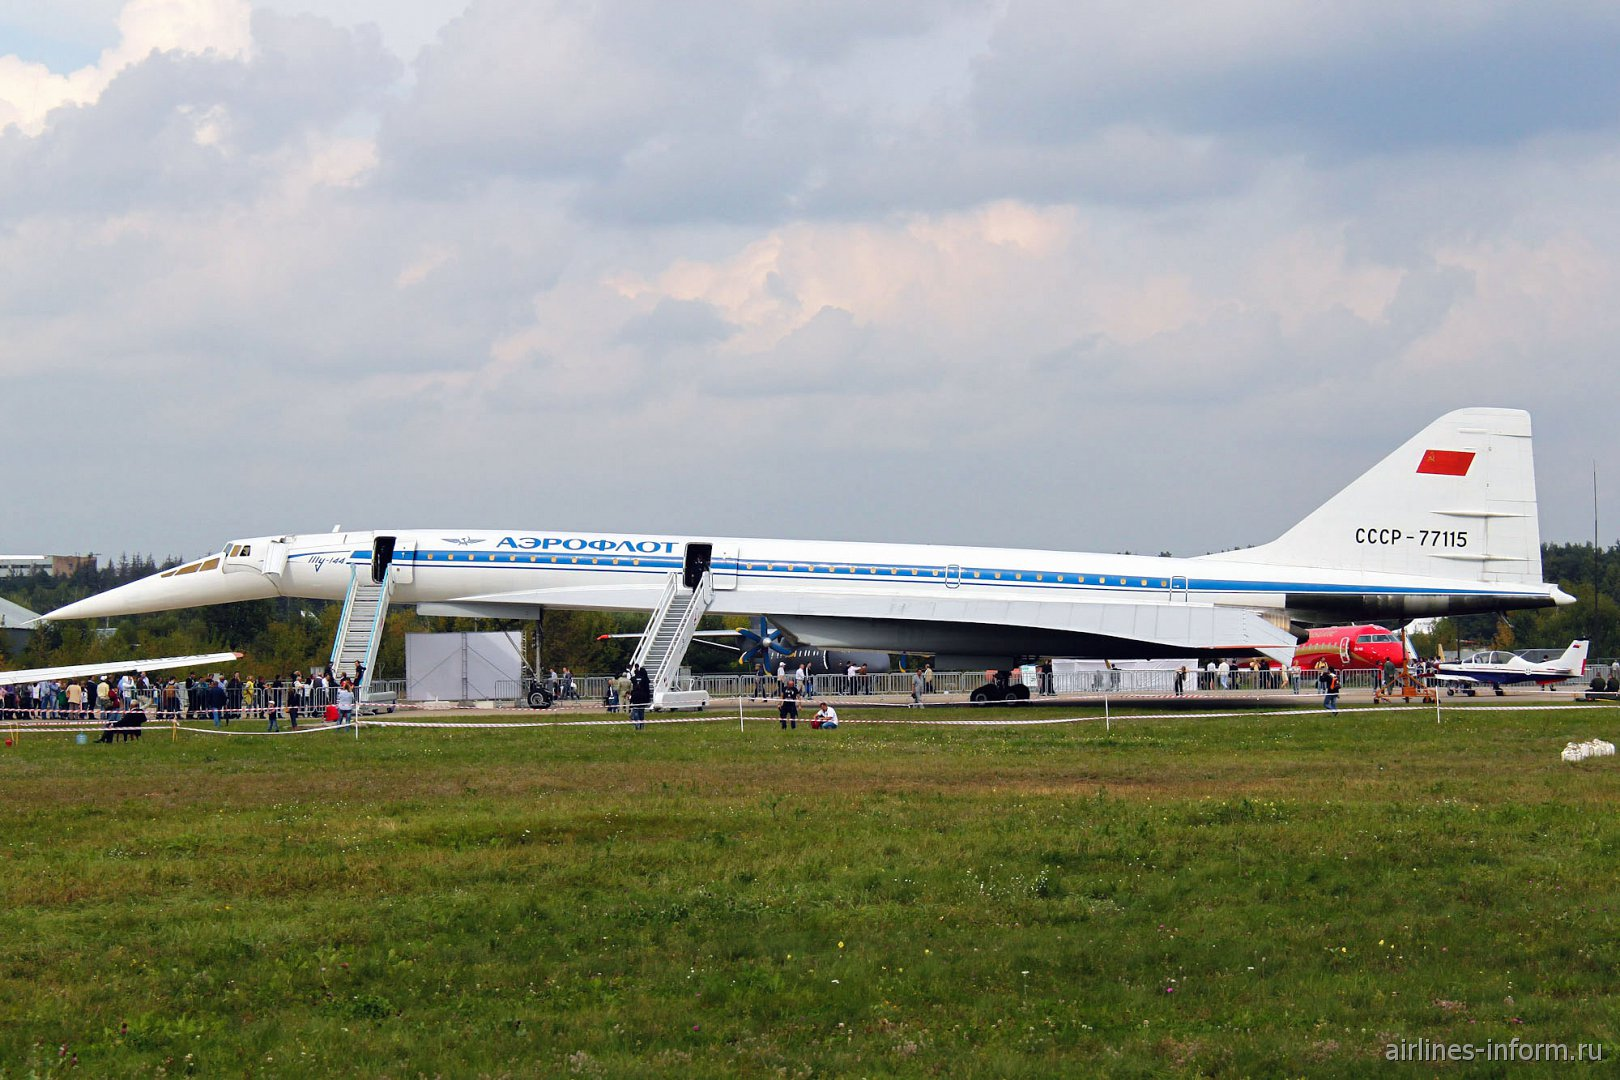 Самолет Ту-144 на авиасалоне МАКС-2013